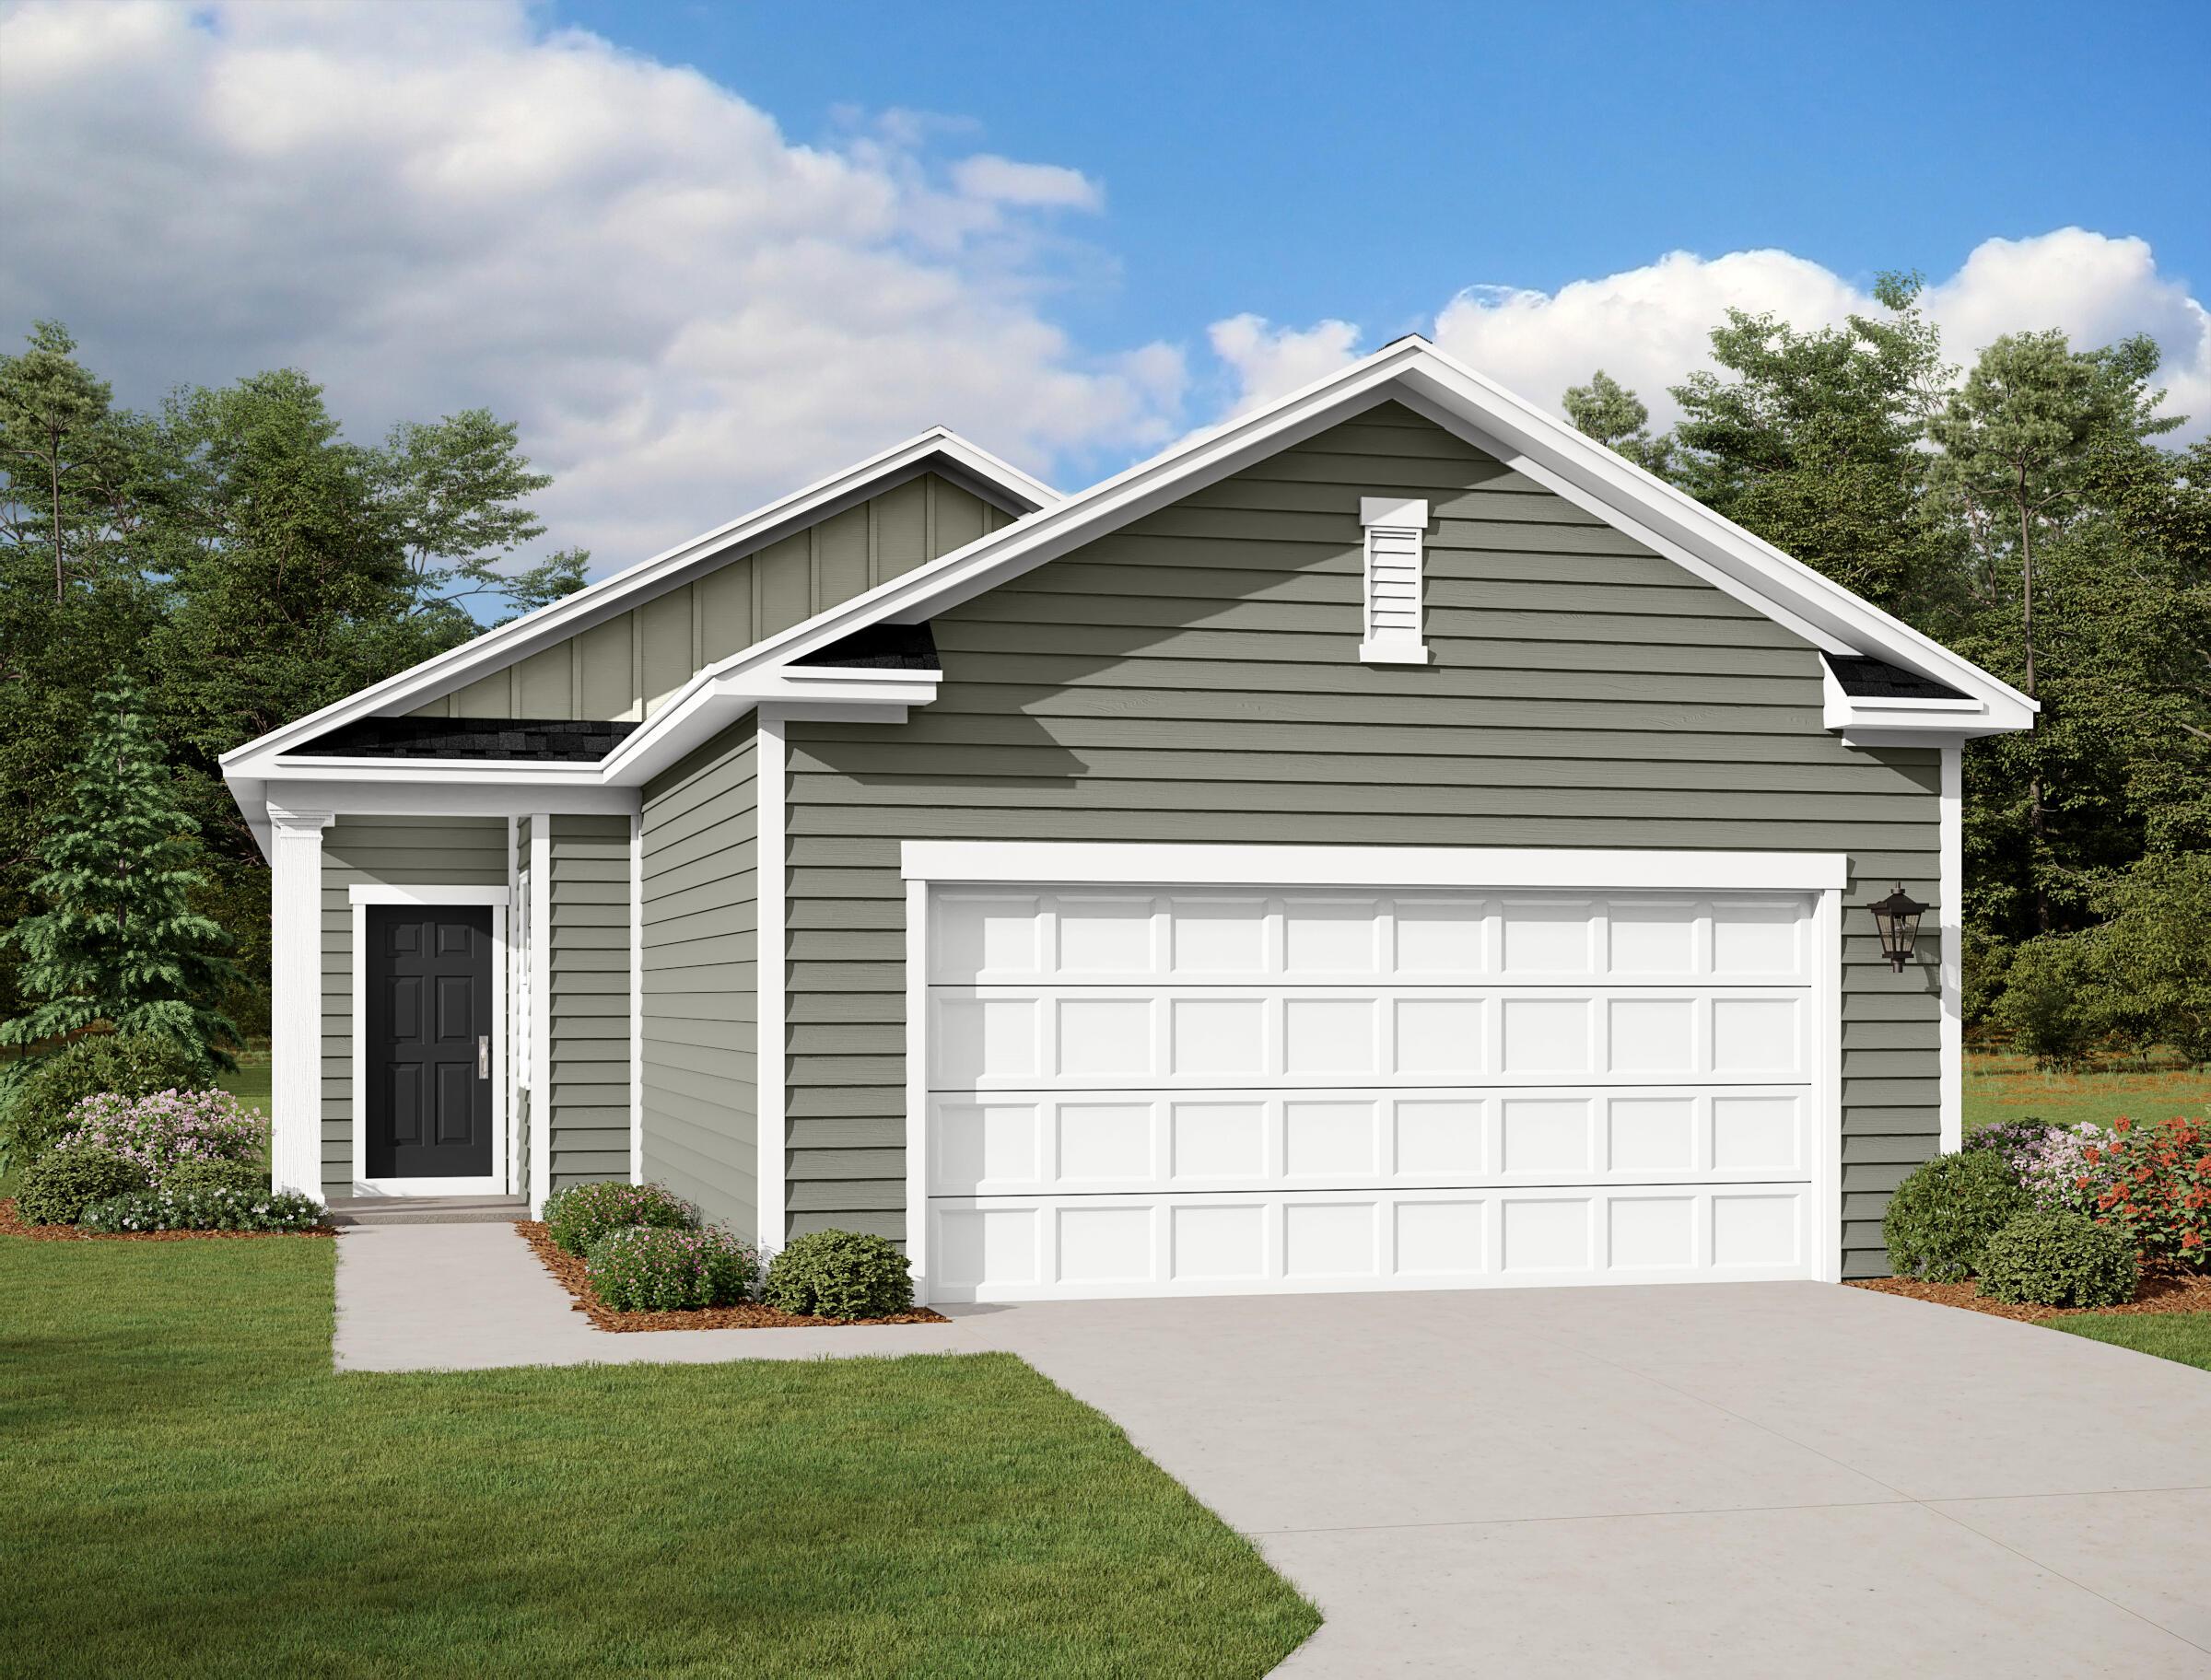 426 Pender Woods Drive Summerville, SC 29486